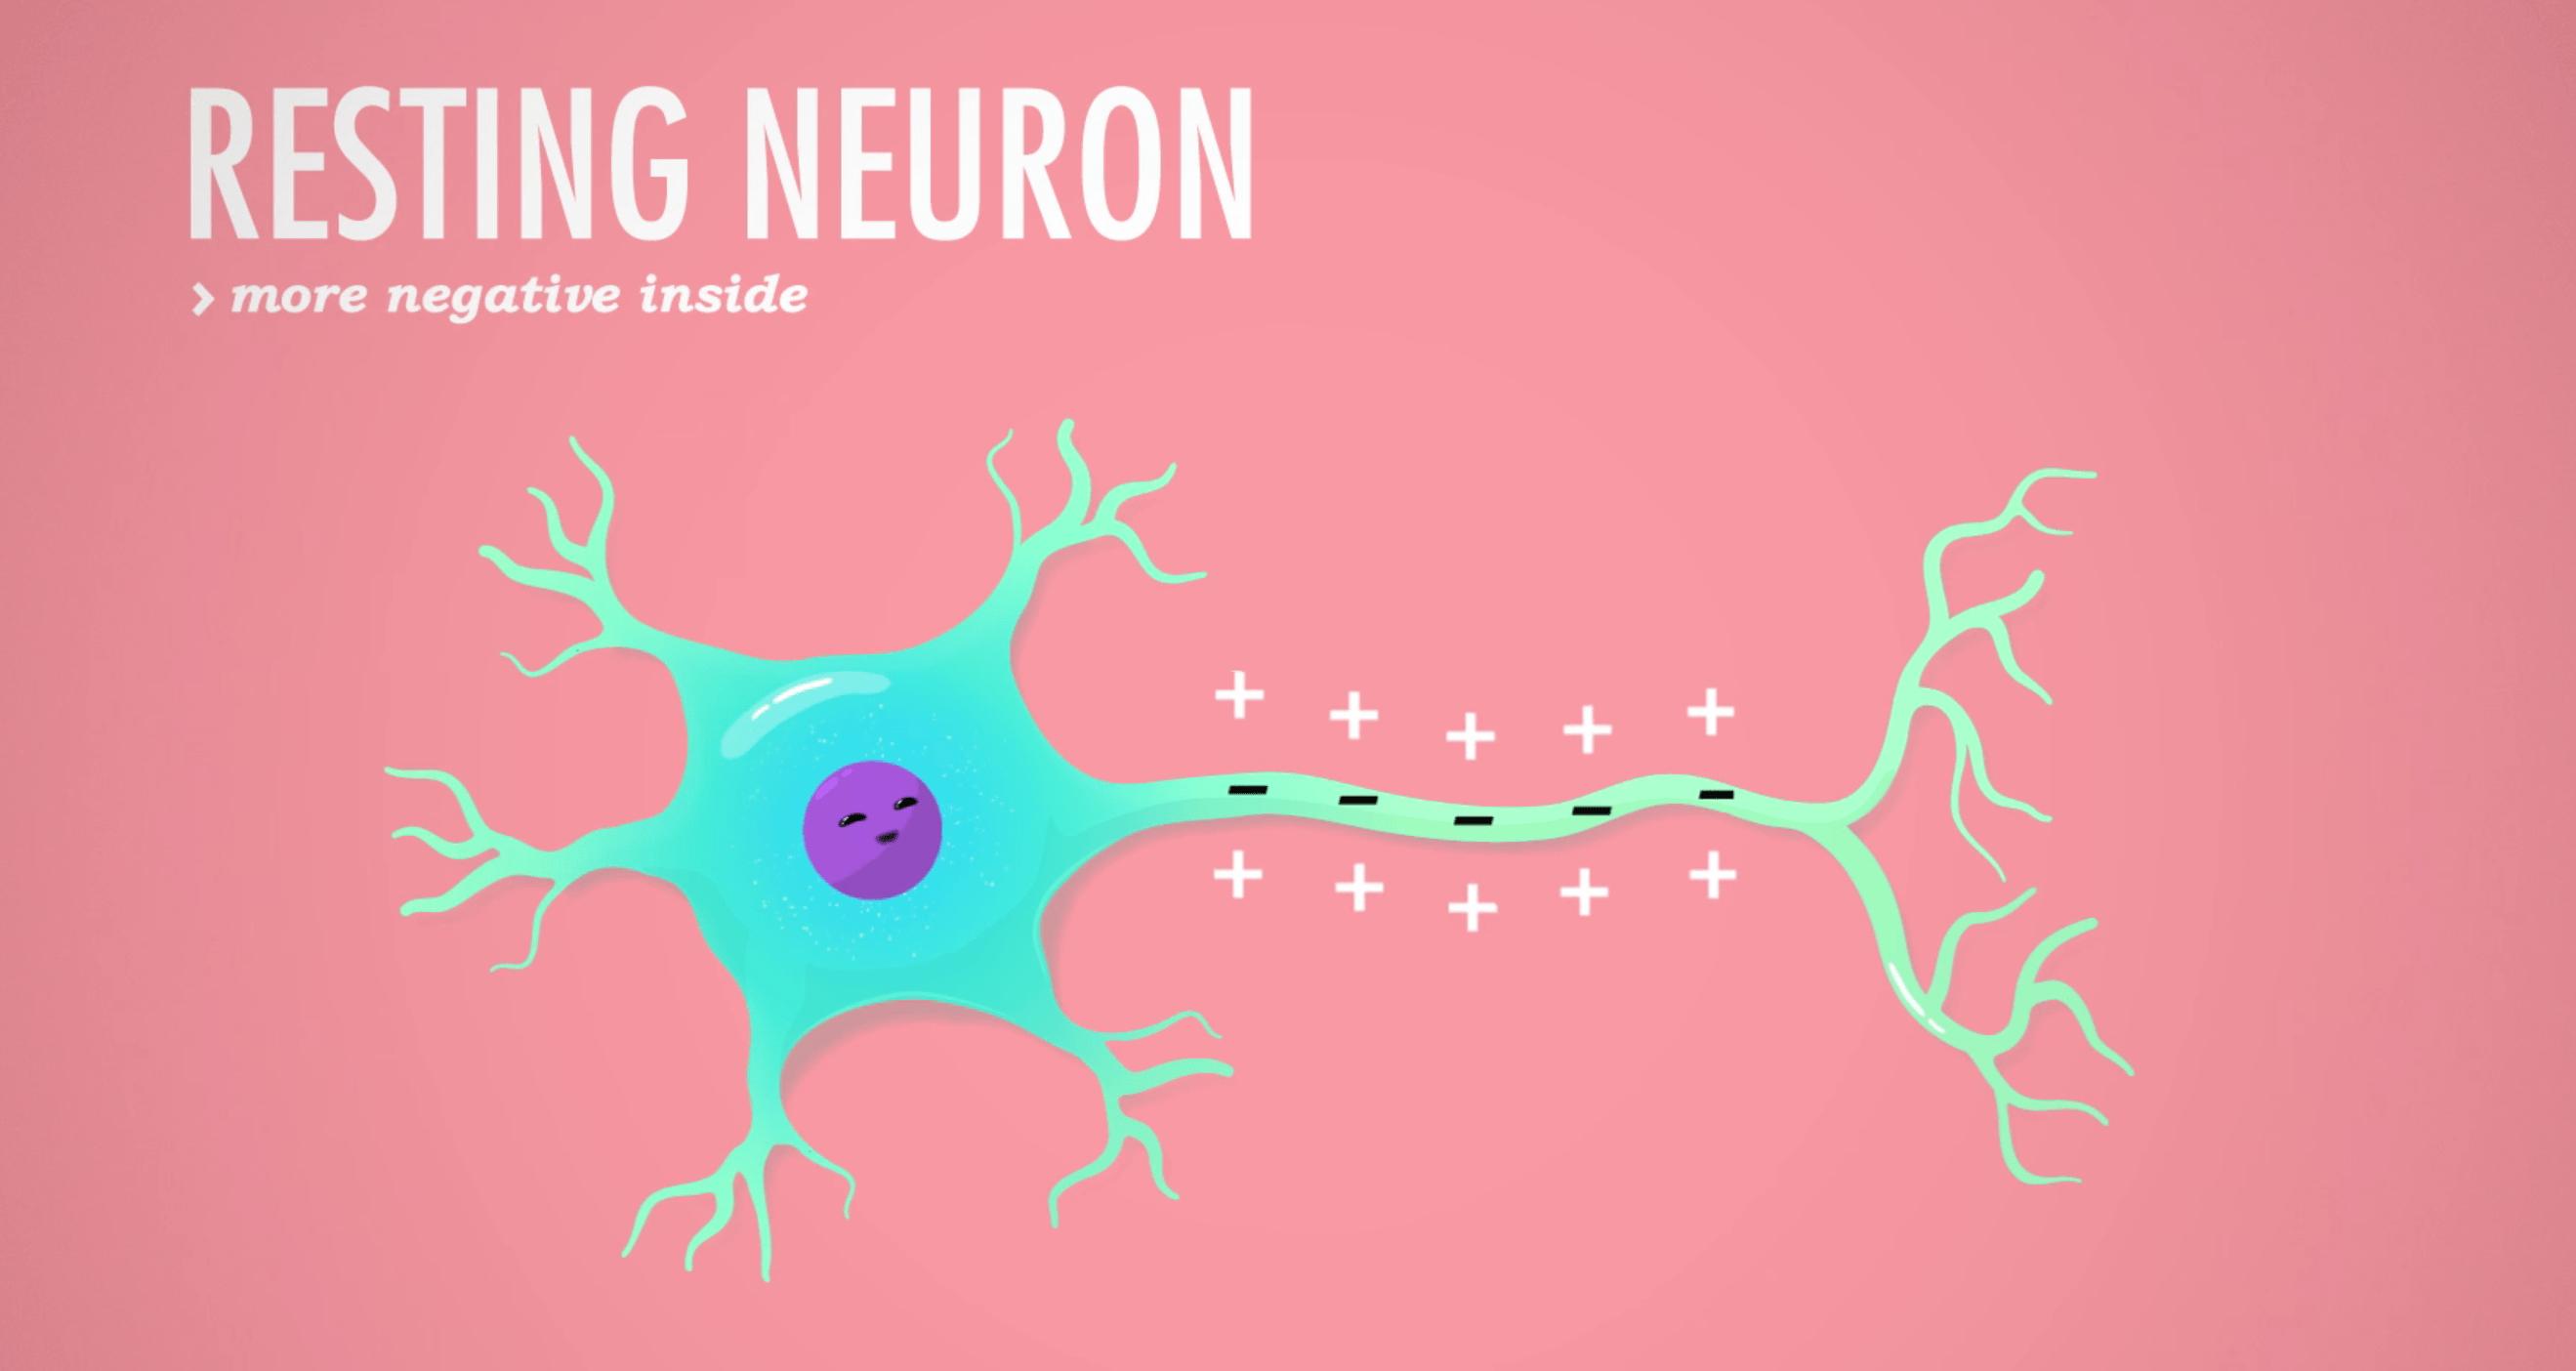 Crash Course Nervous System 2: How Action Potentials Work